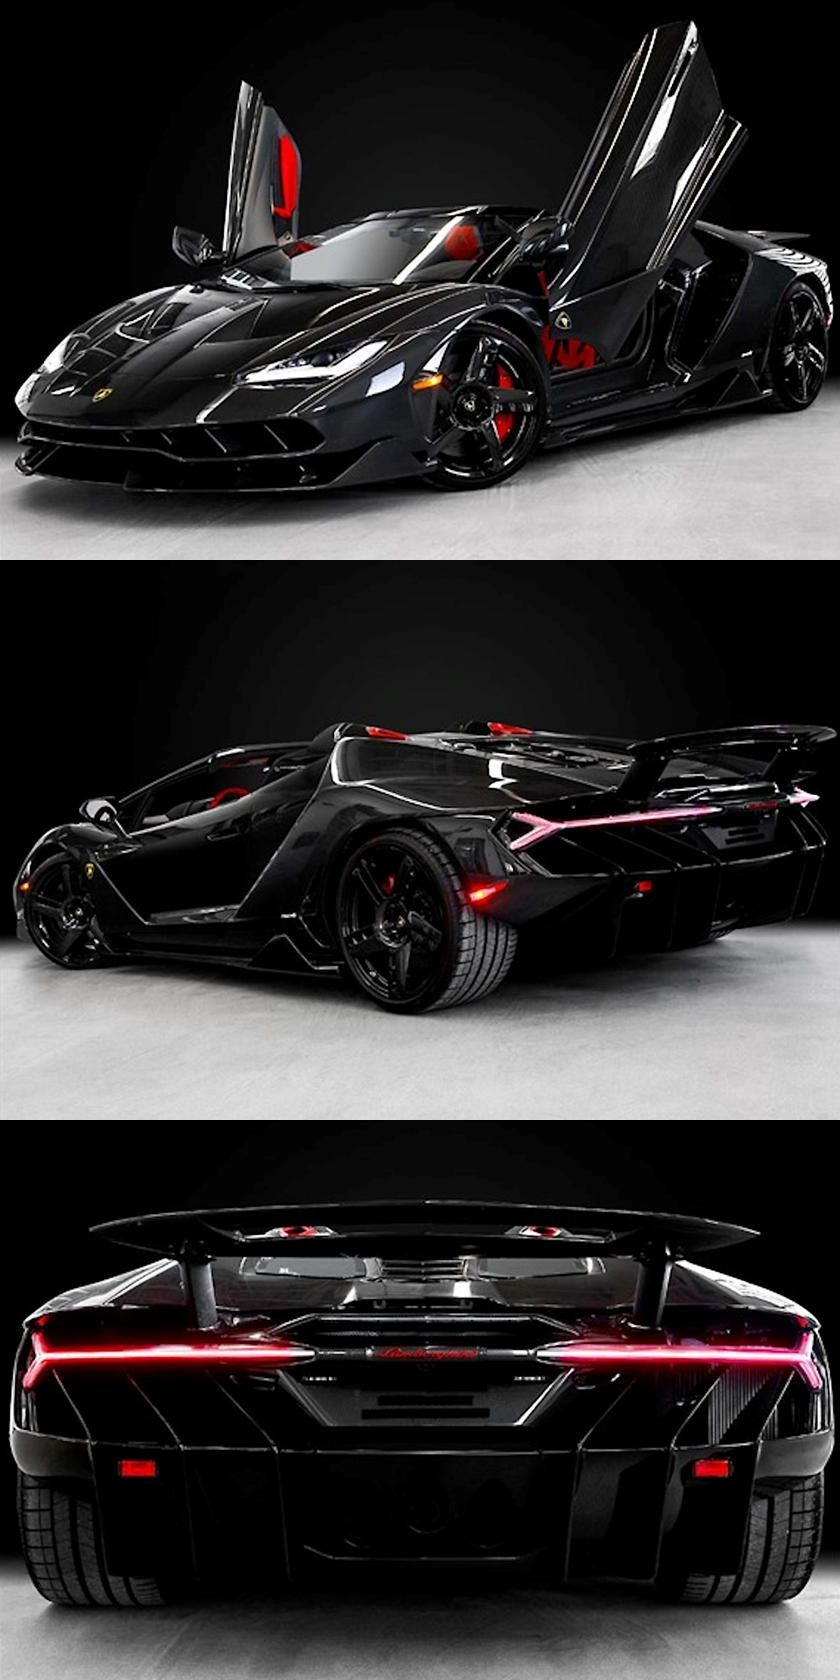 This Rare Lamborghini Centenario Is A 2 Million Bargain Built To Celebrate Ferruccio Lamborghini S In 2020 Lamborghini Centenario Luxury Cars Range Rover Lamborghini